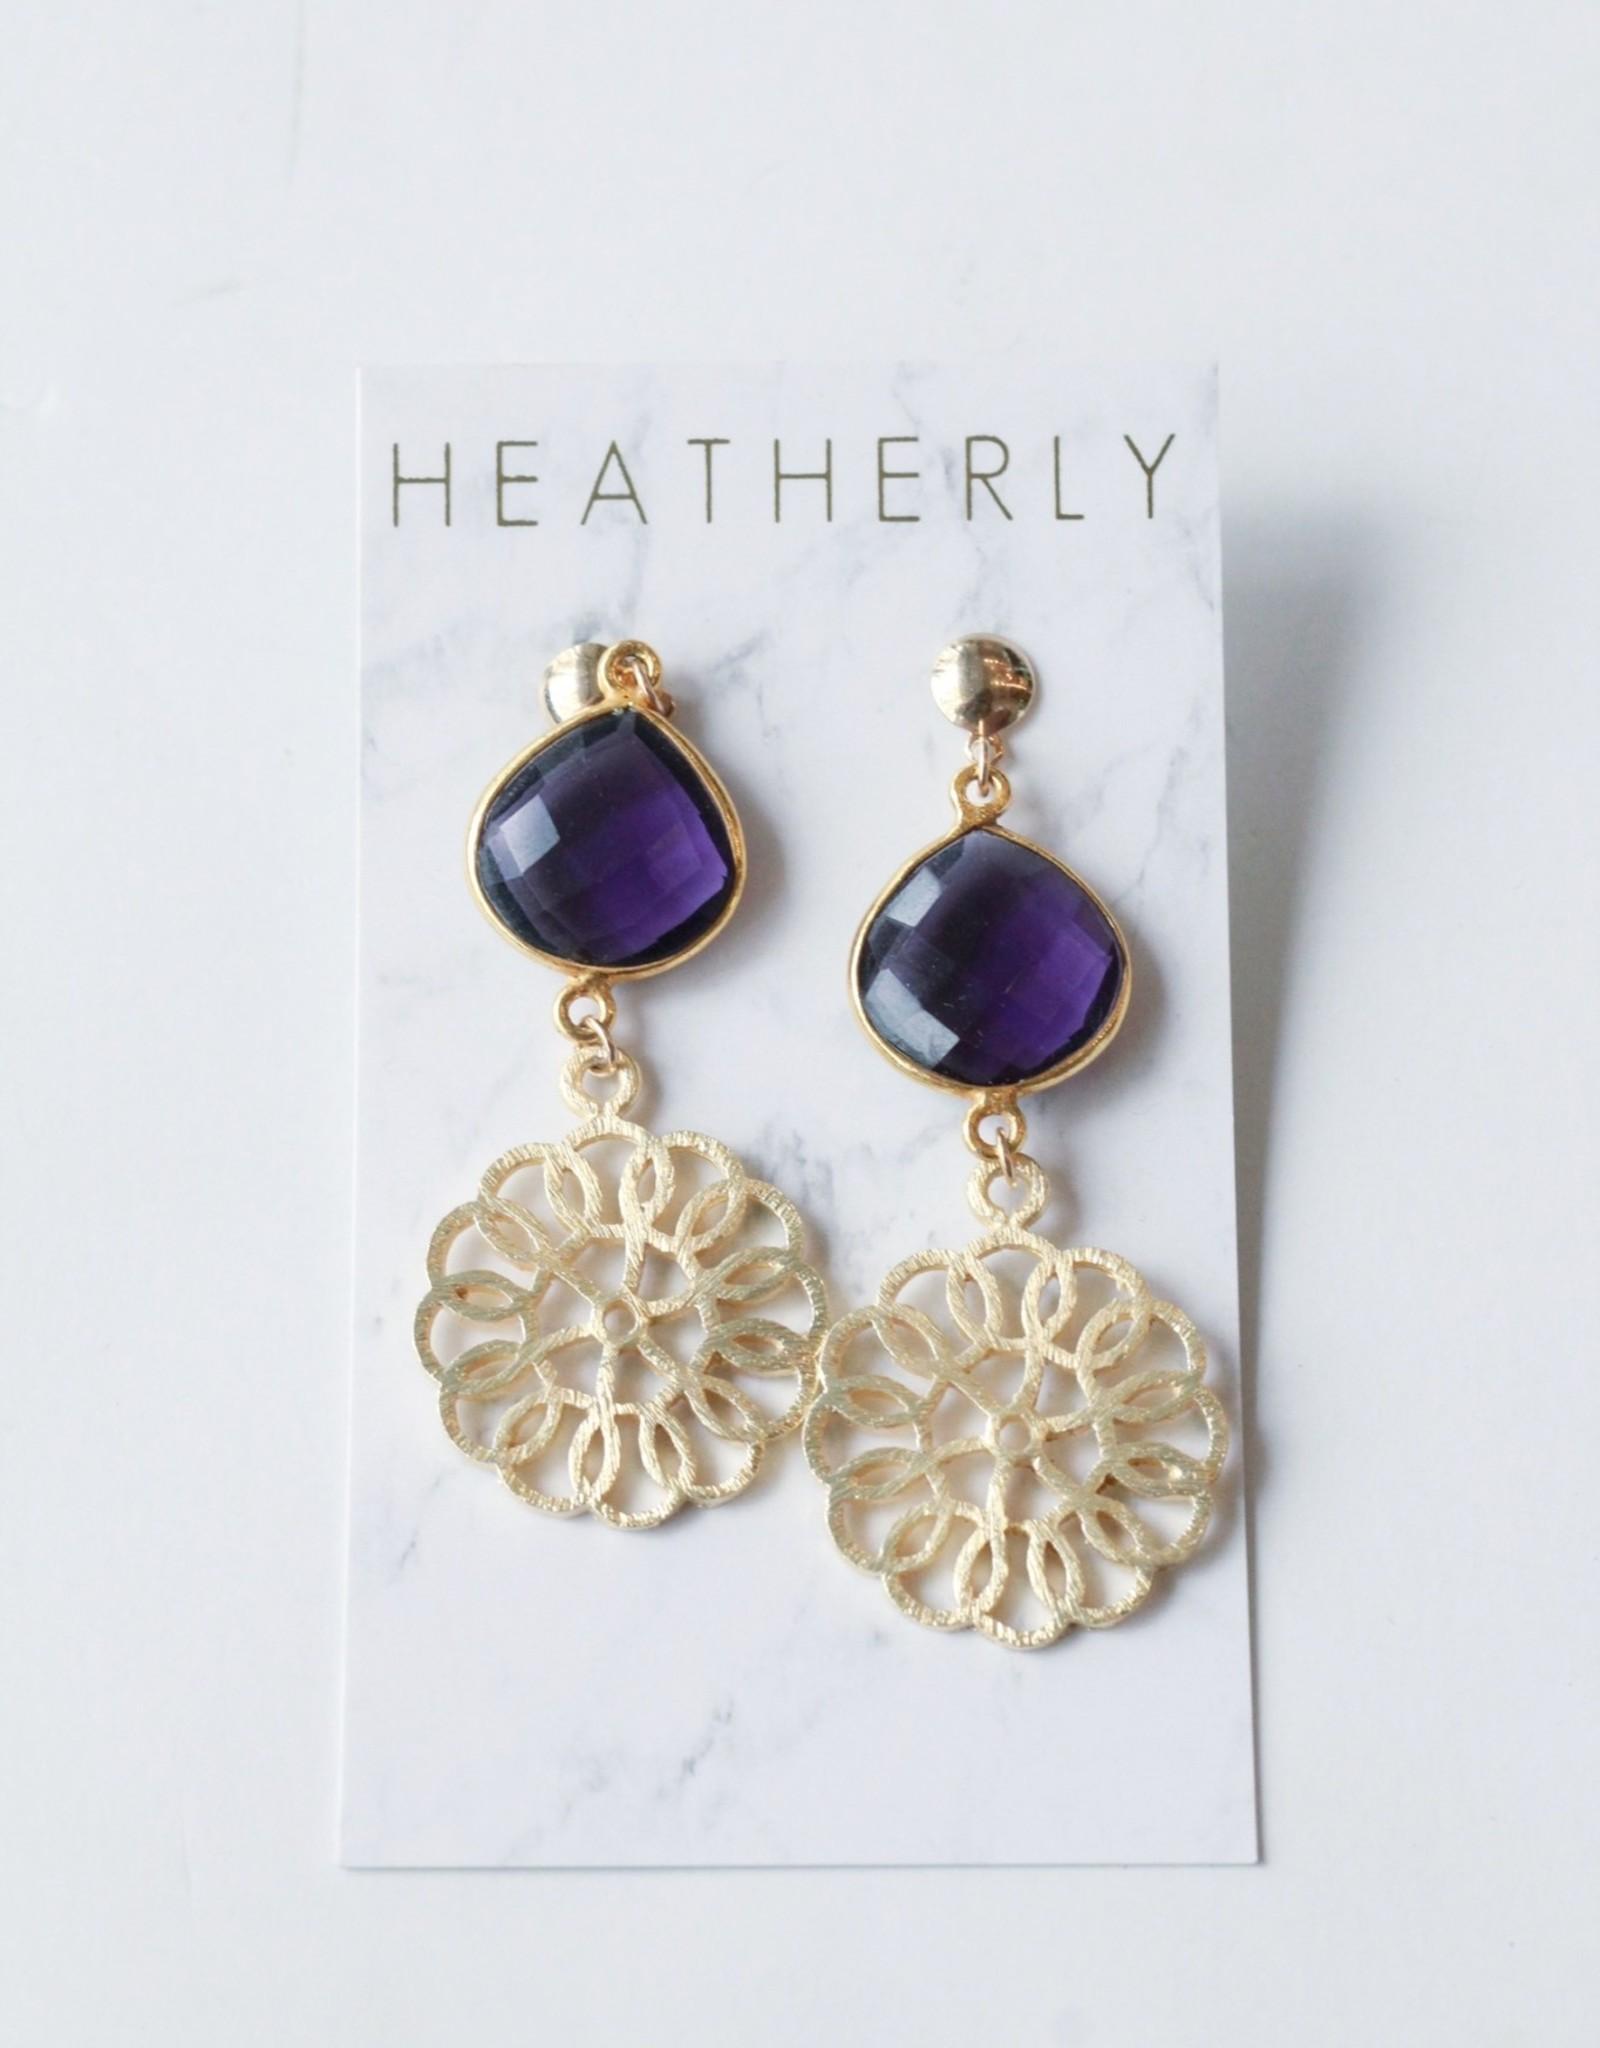 Heatherly Heatherly Leigh Earrings